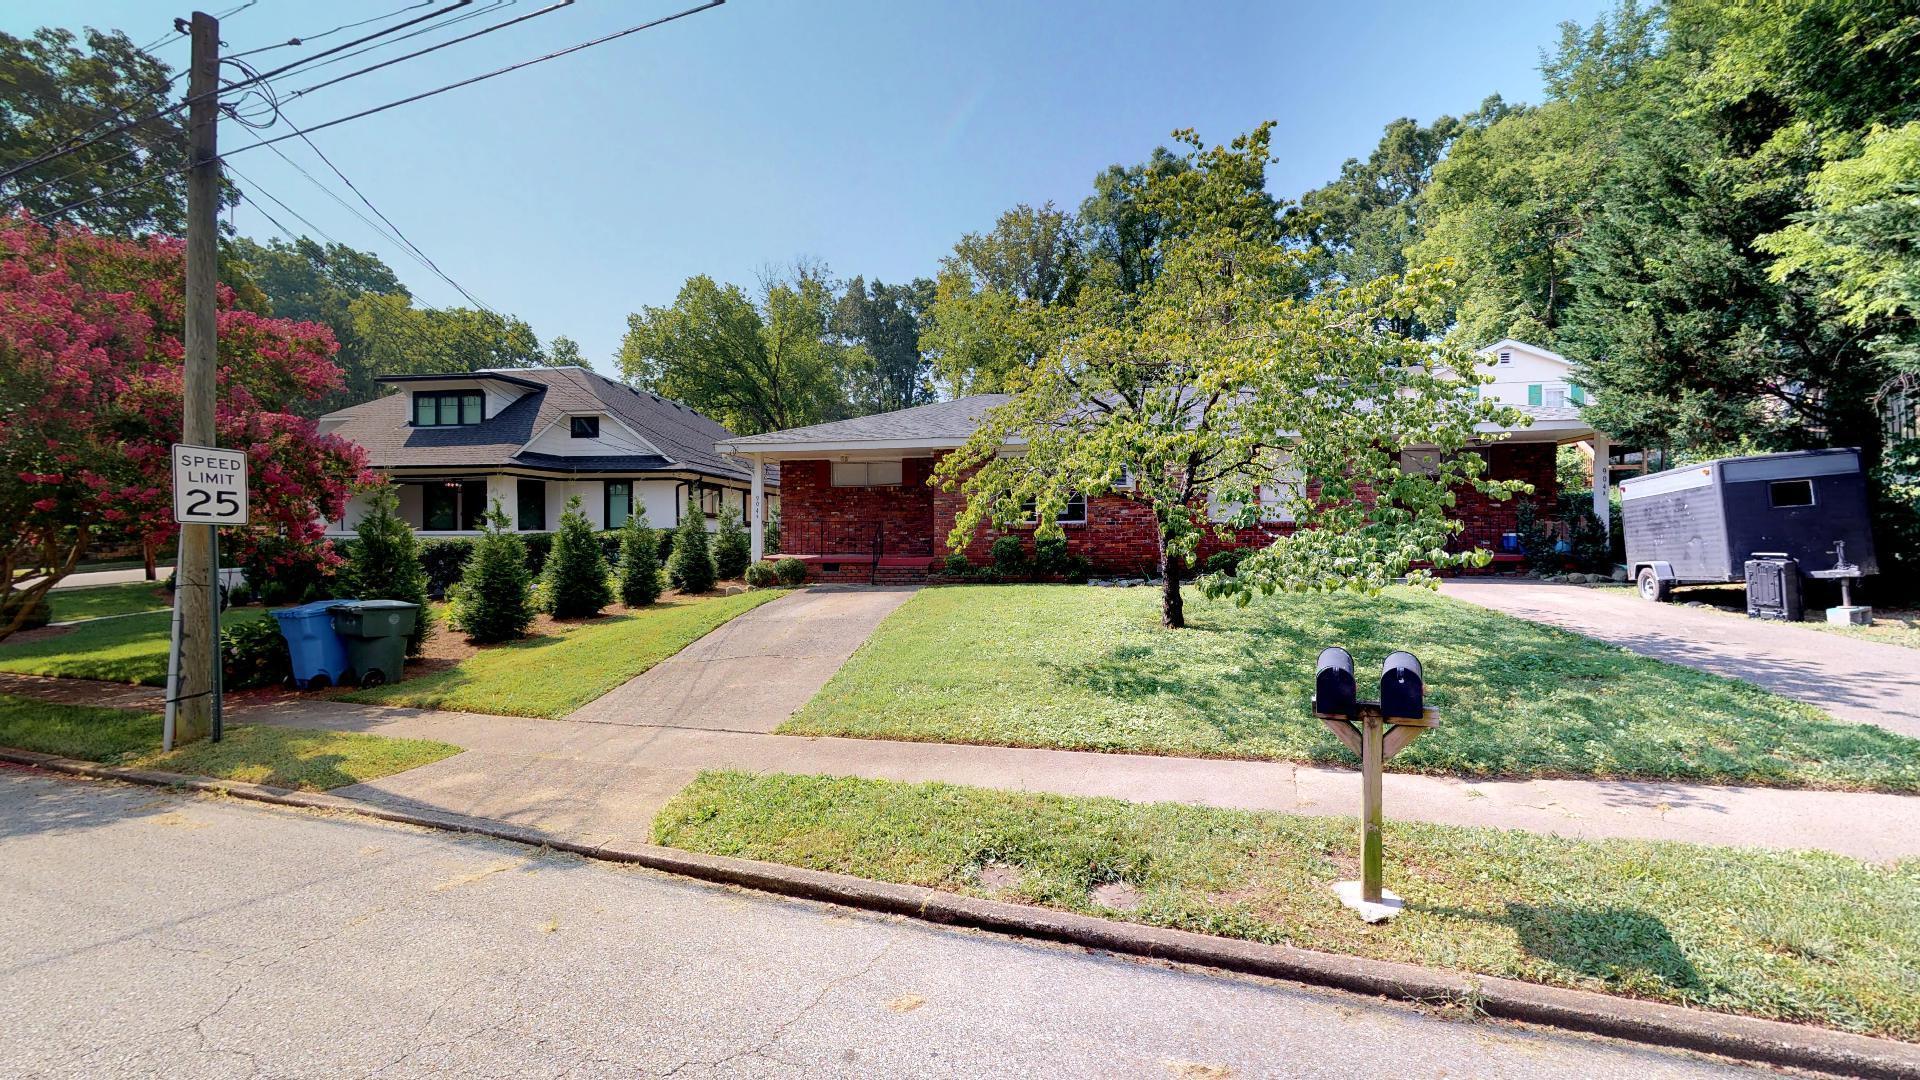 904 Tremont St, Chattanooga, TN 37405